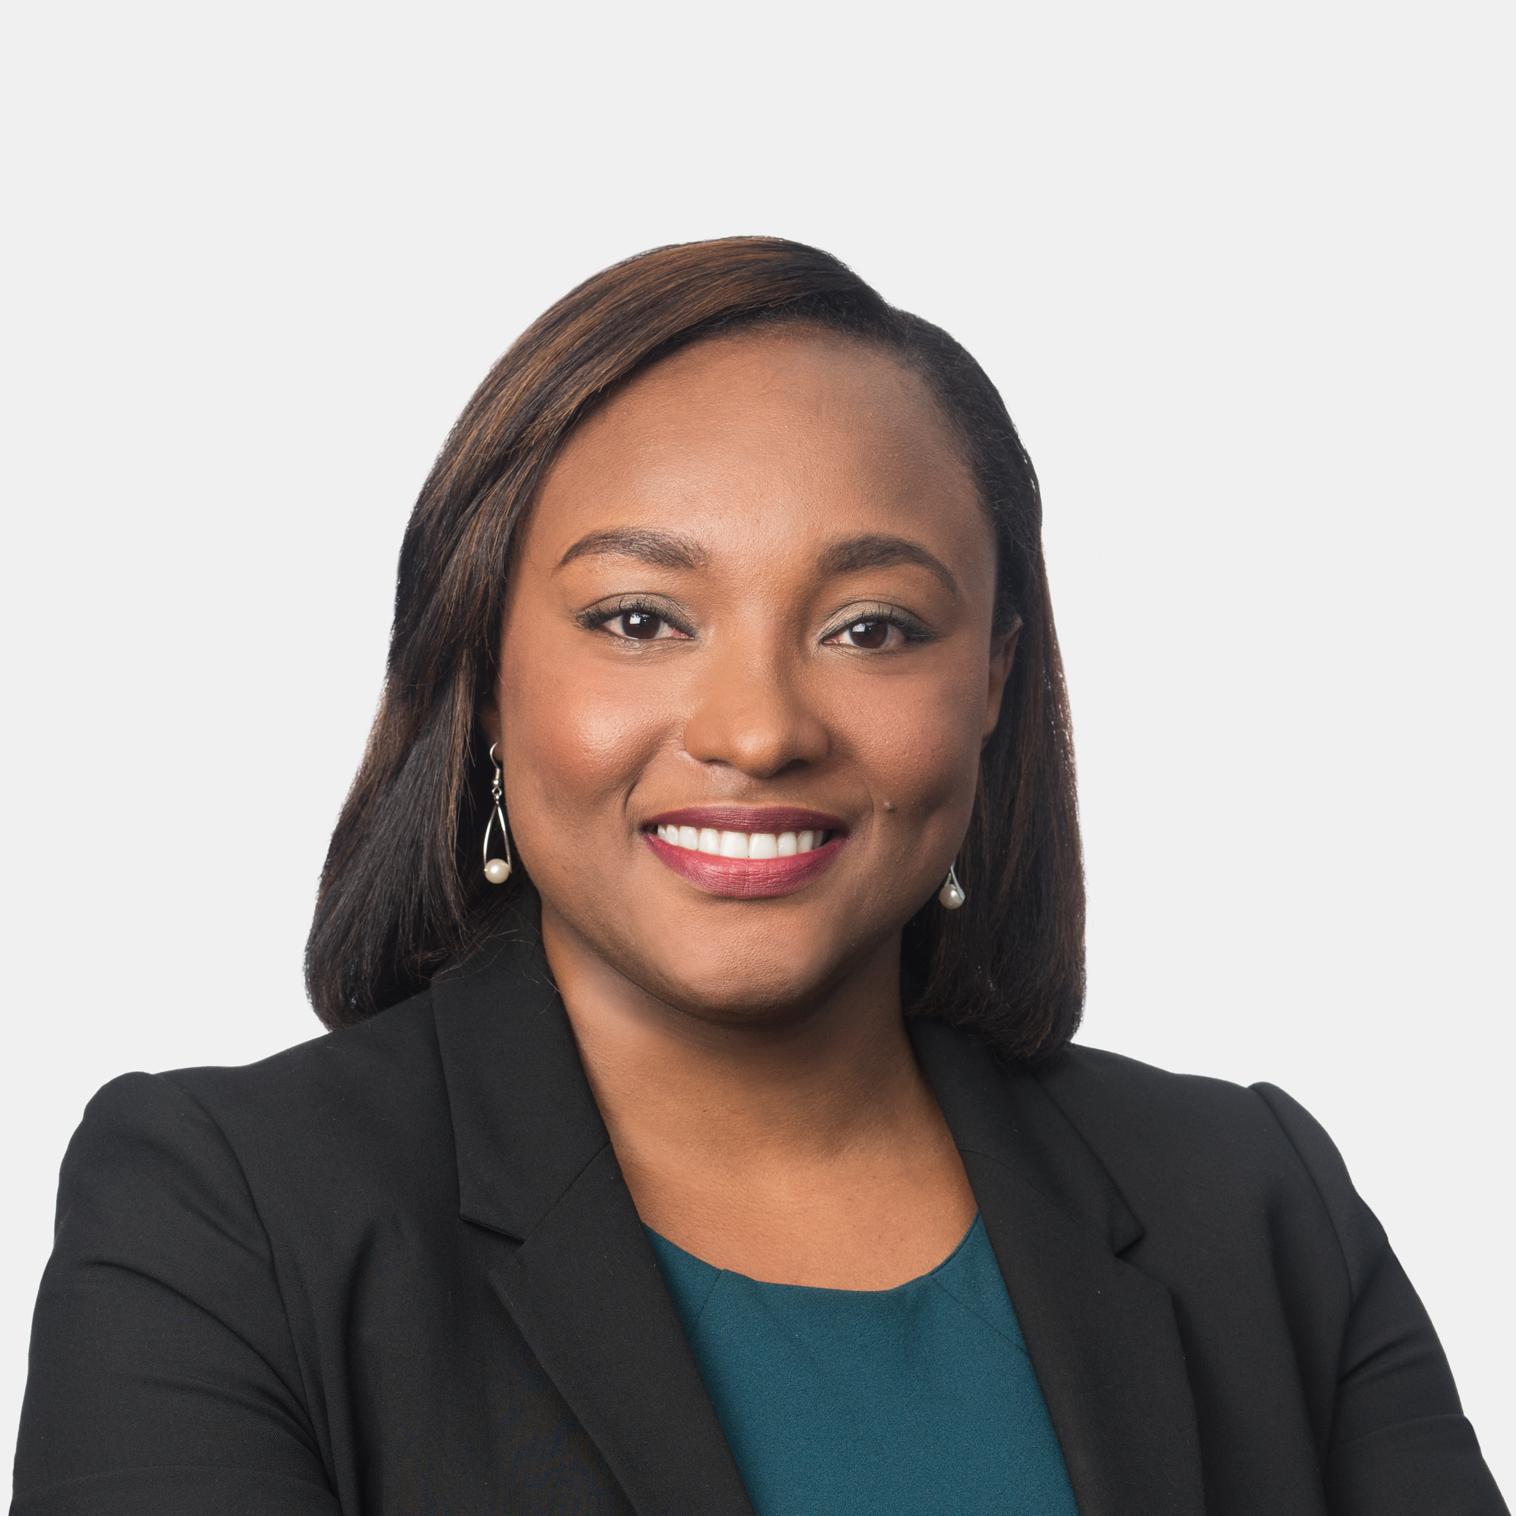 Tara A. Jackson